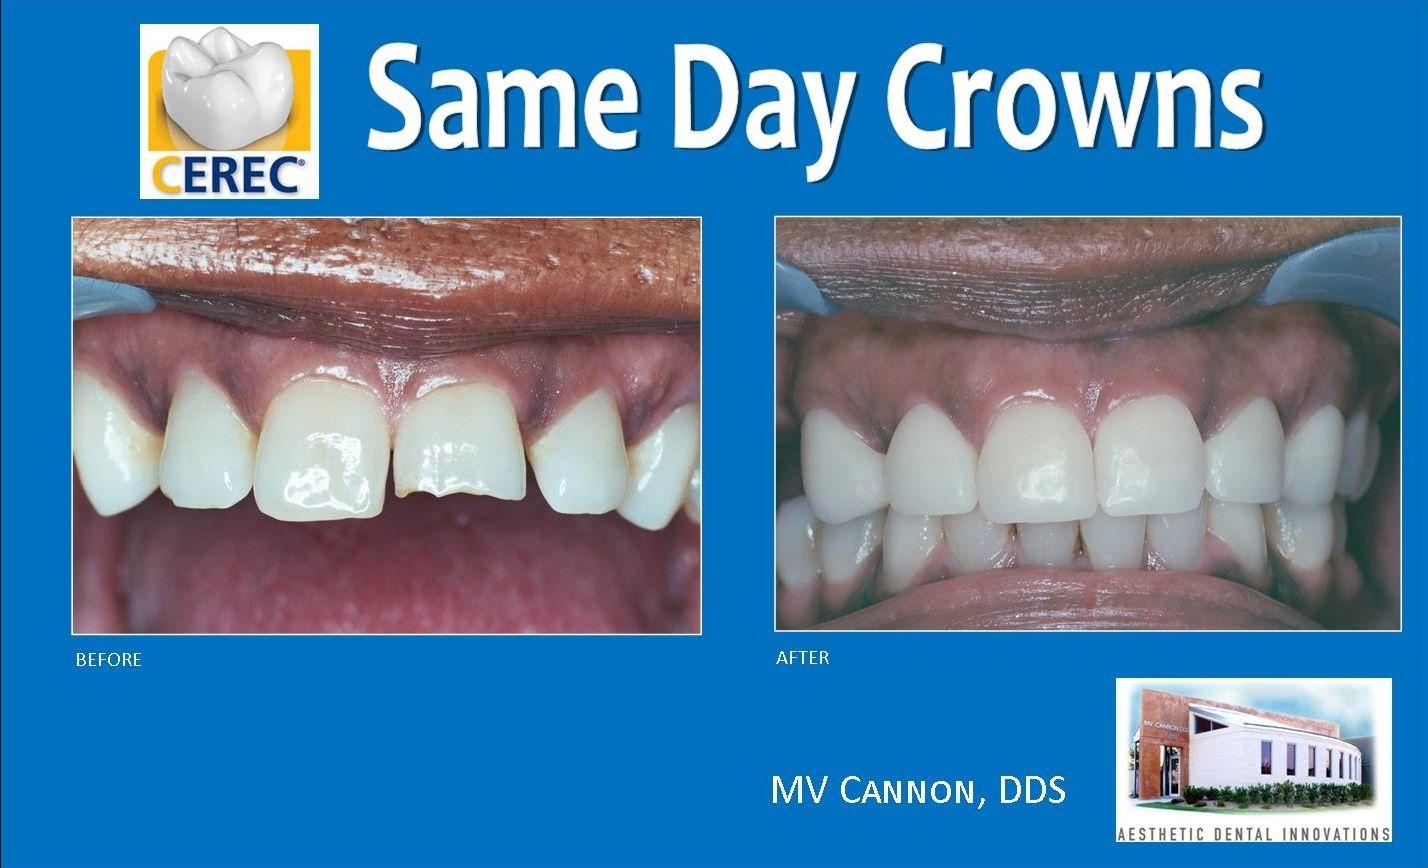 CEREC Same Day Crowns Teeth straightening, Tooth crown